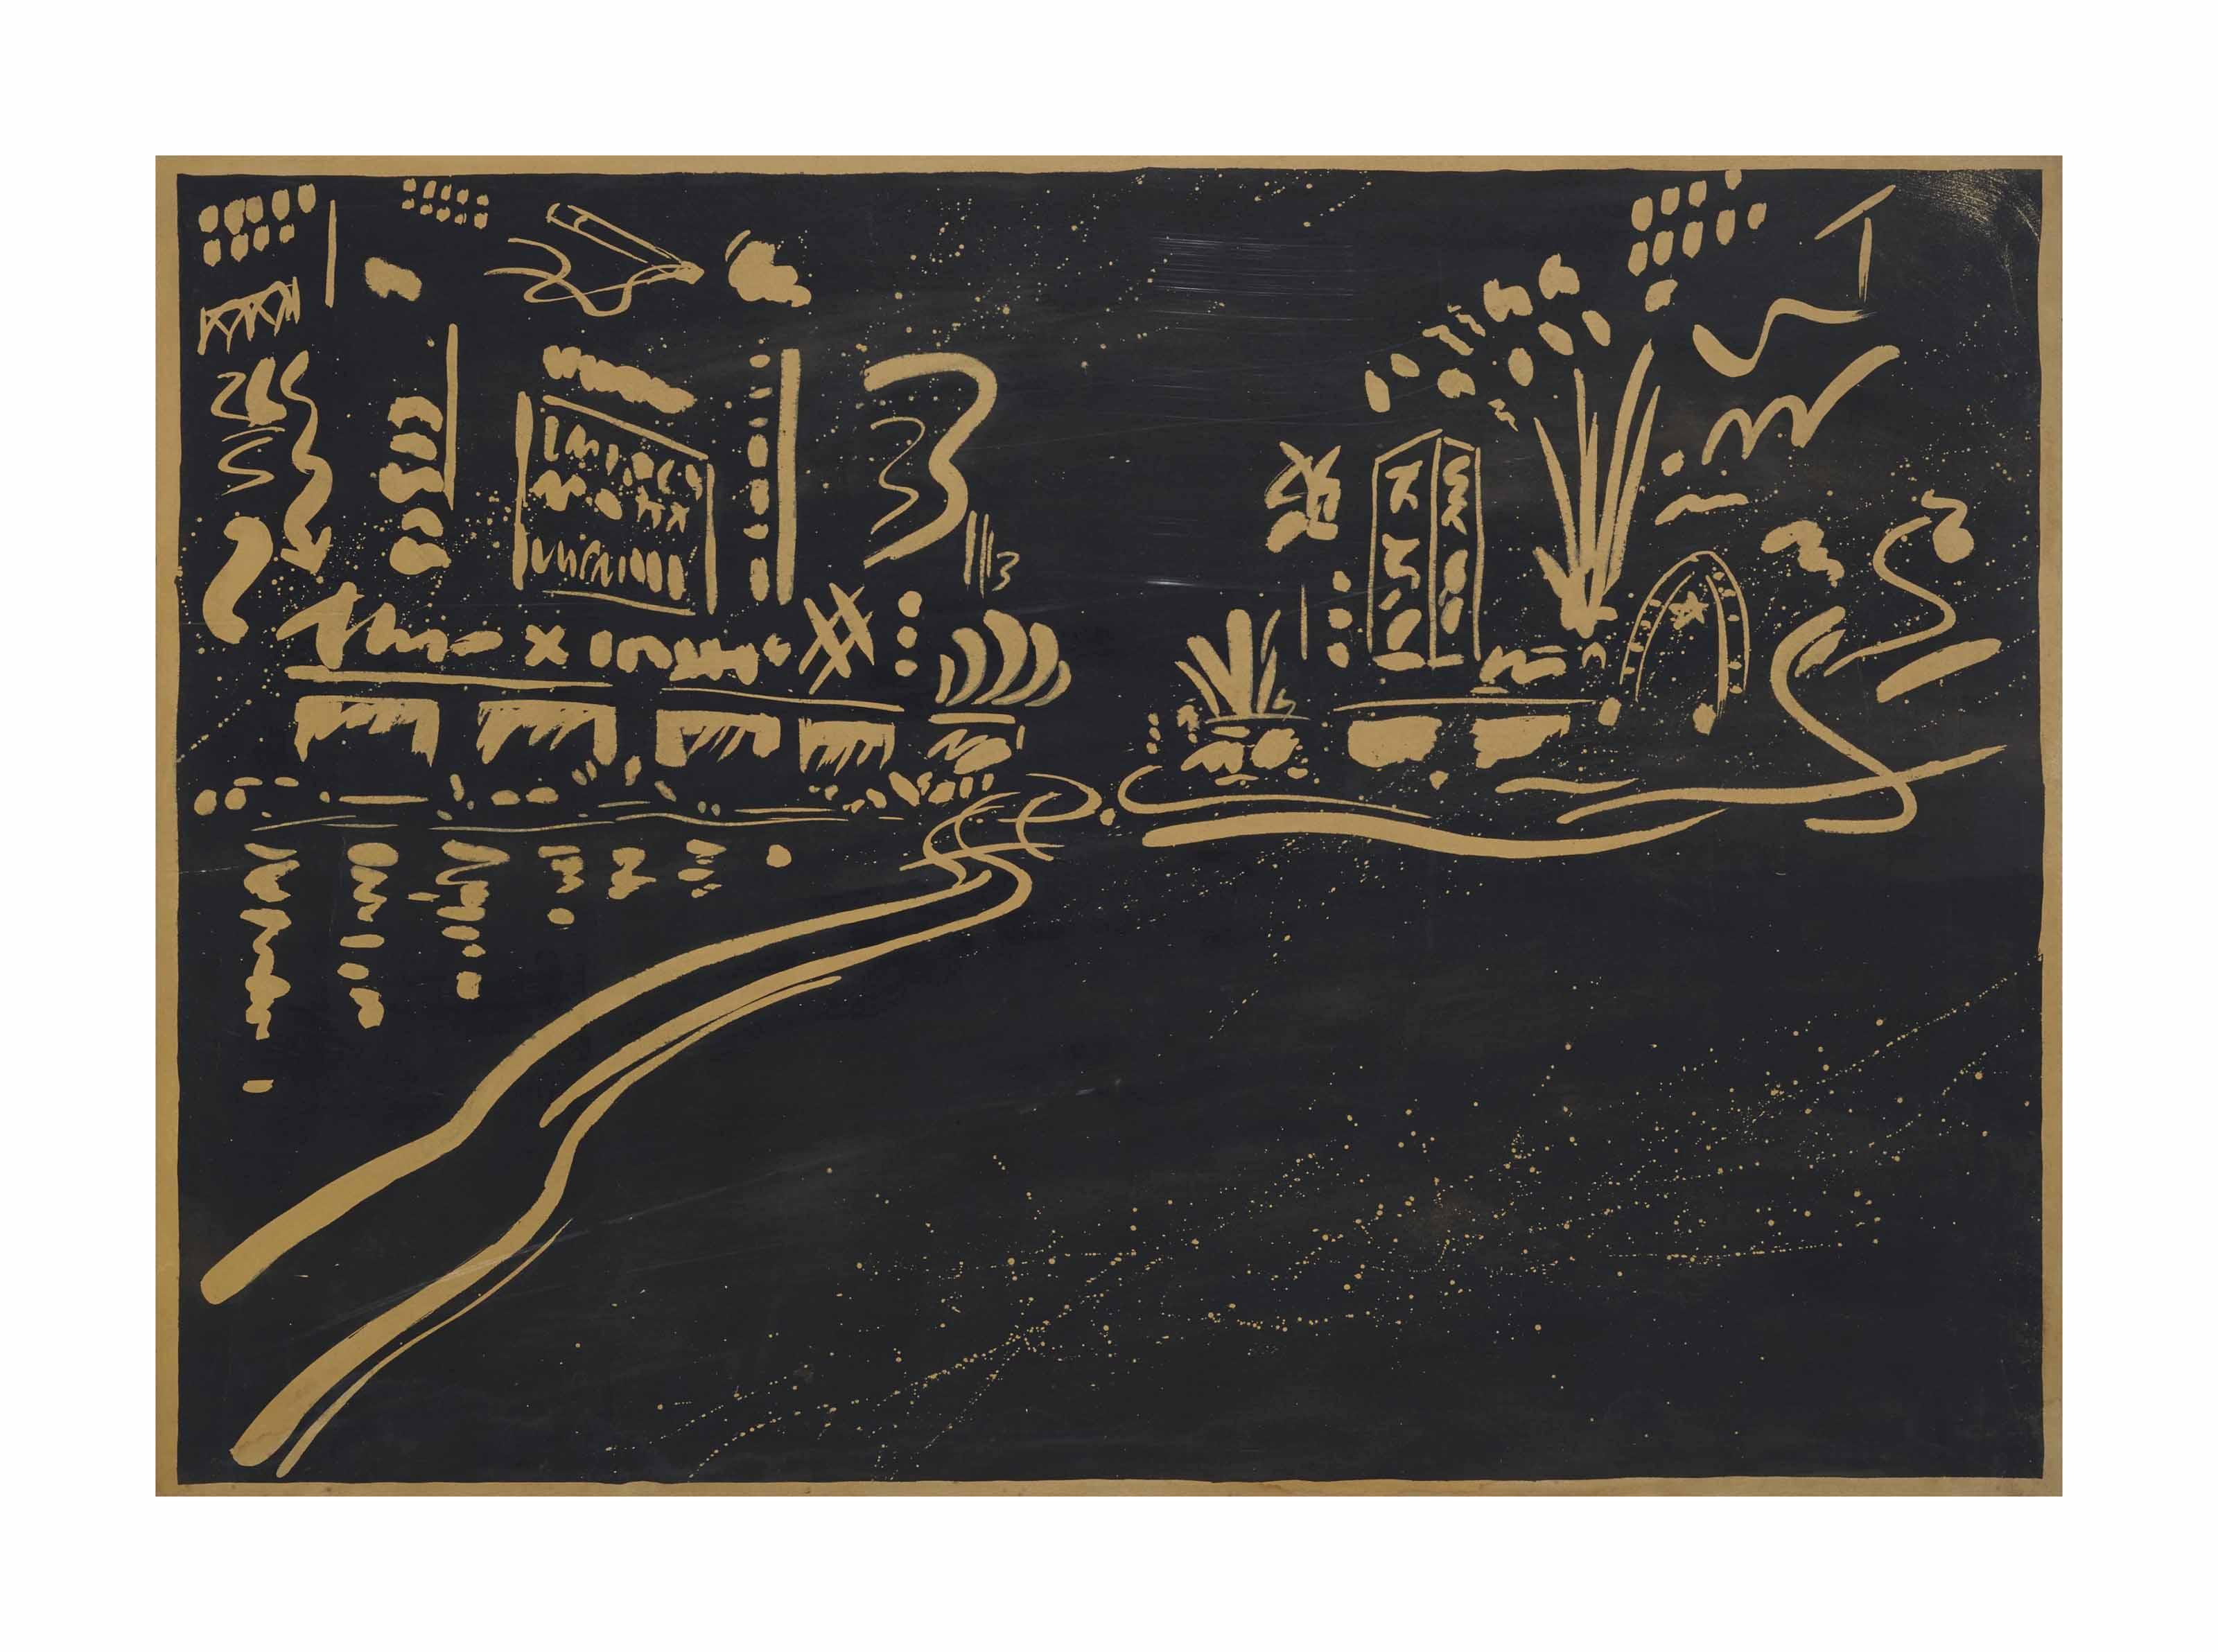 City Lights, um 1974